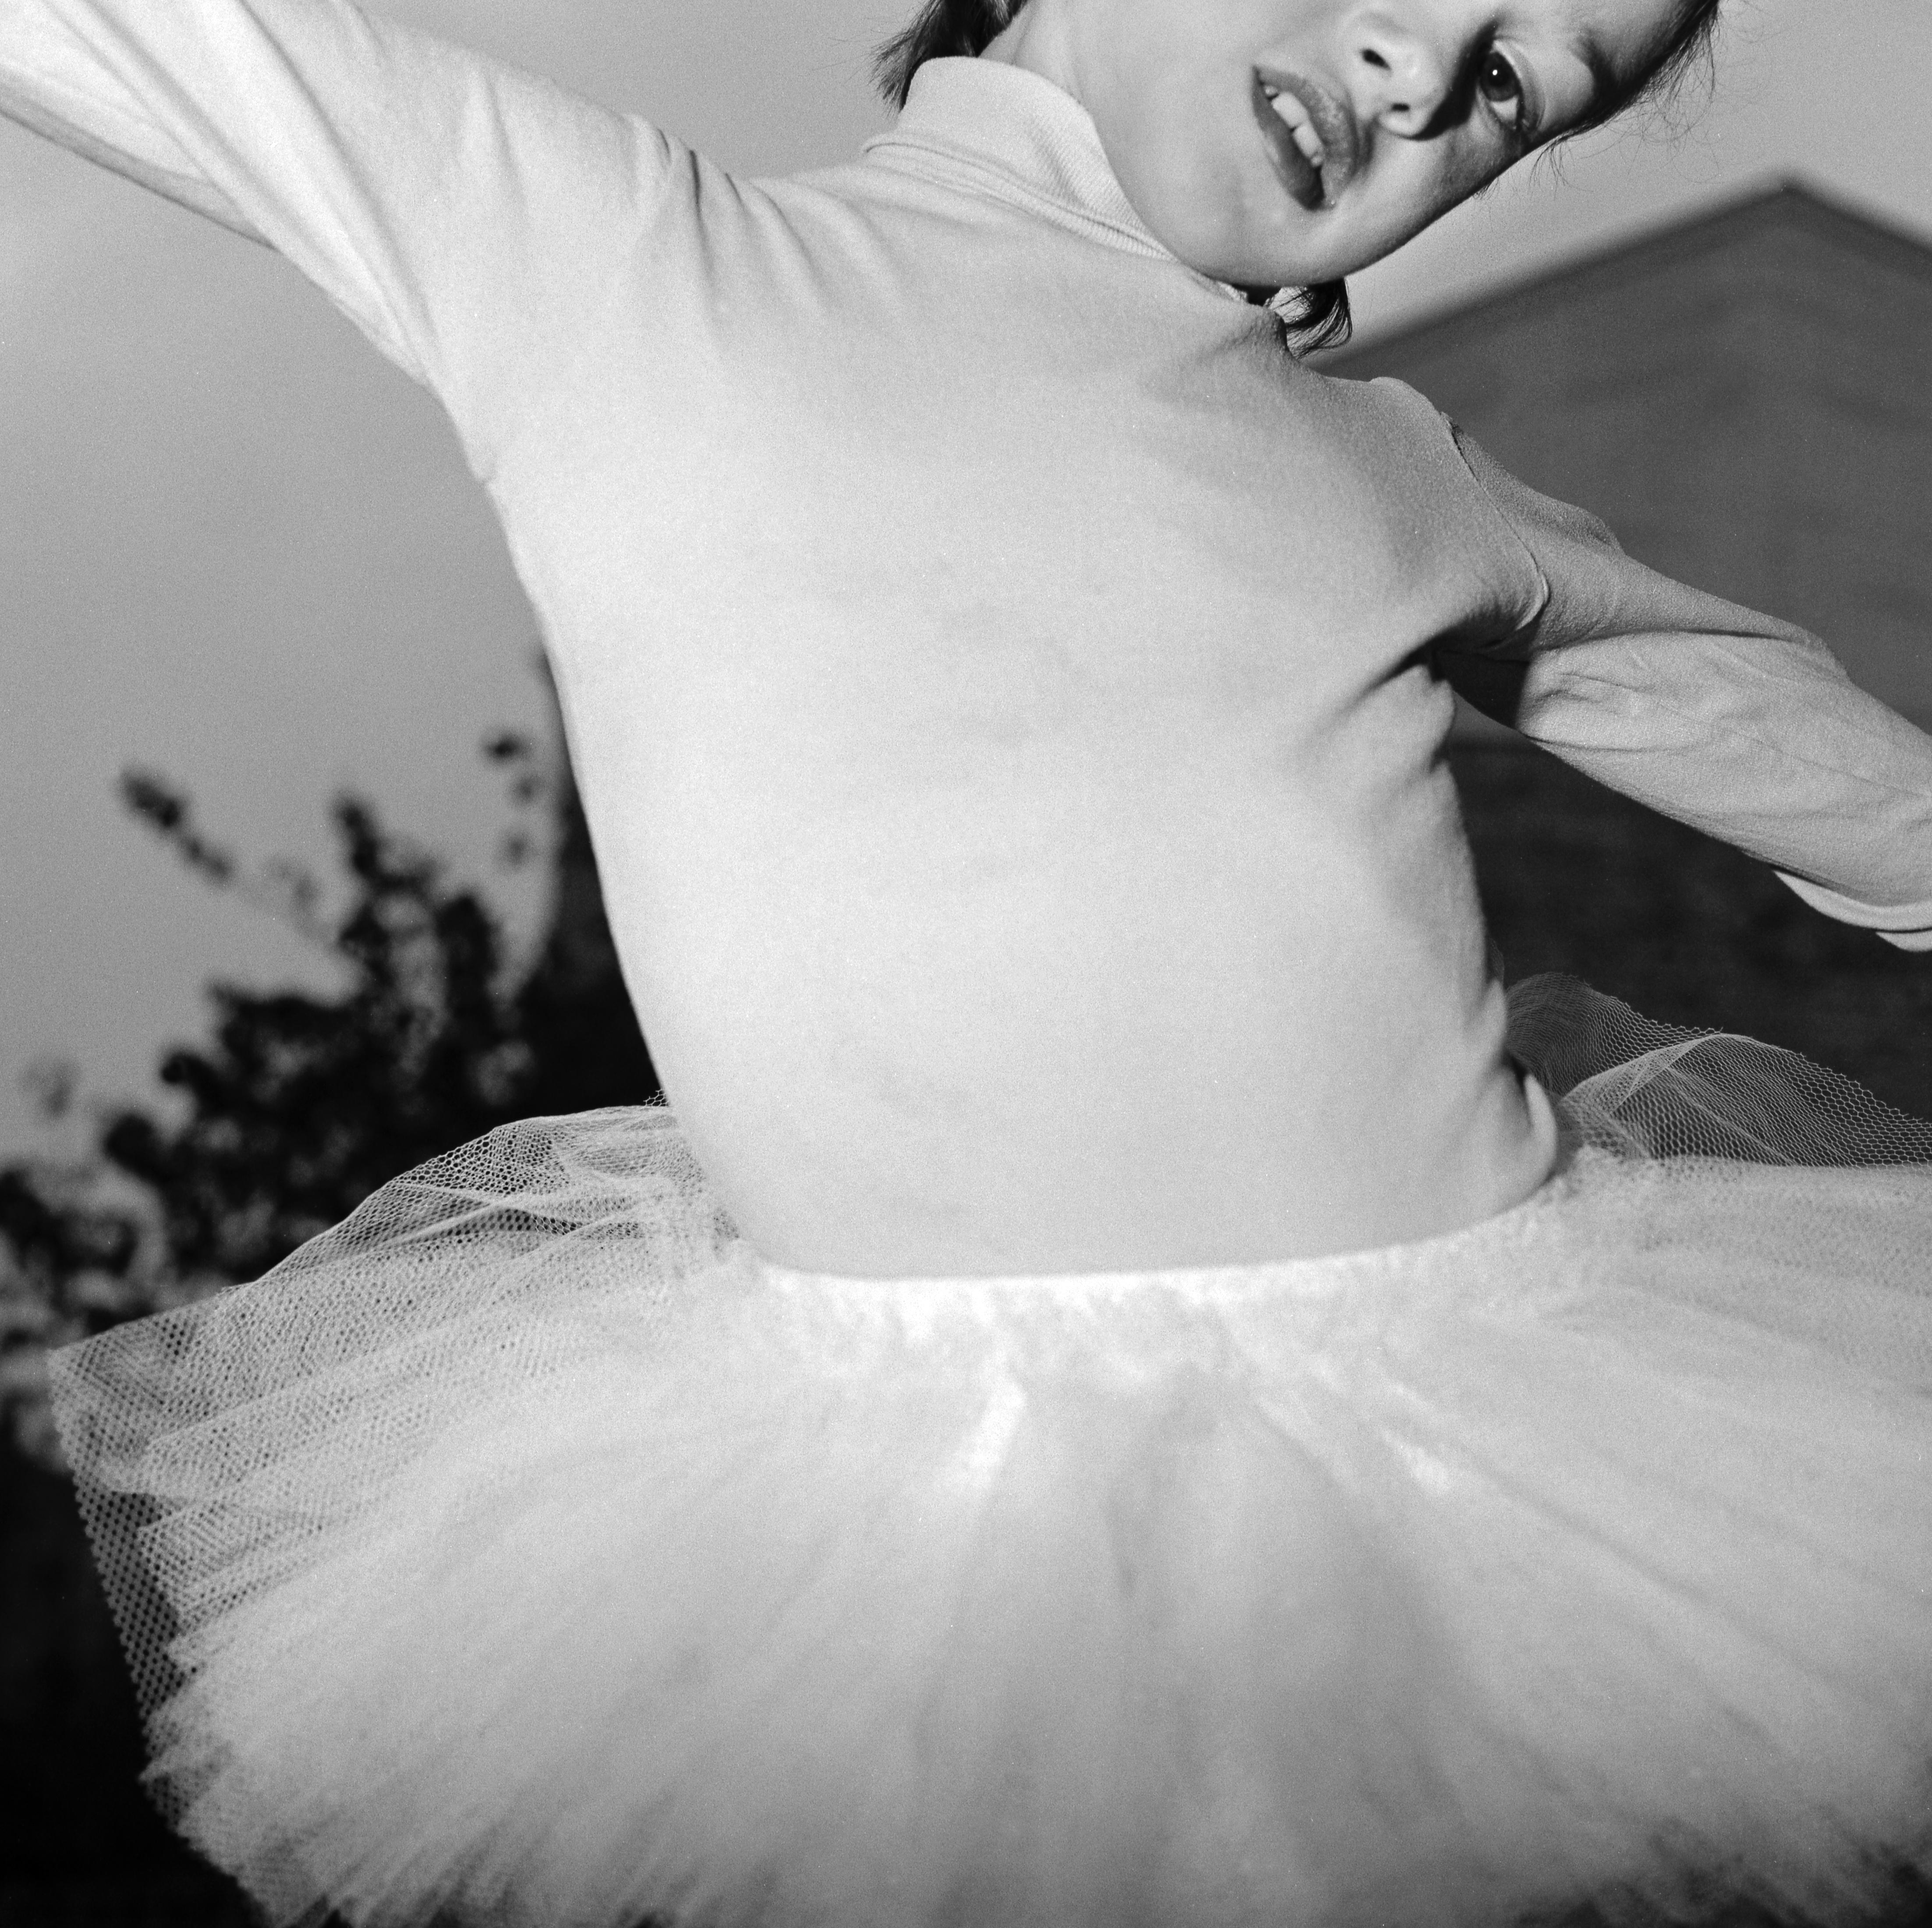 '82 Alison Ballerina, Bel Air, MD